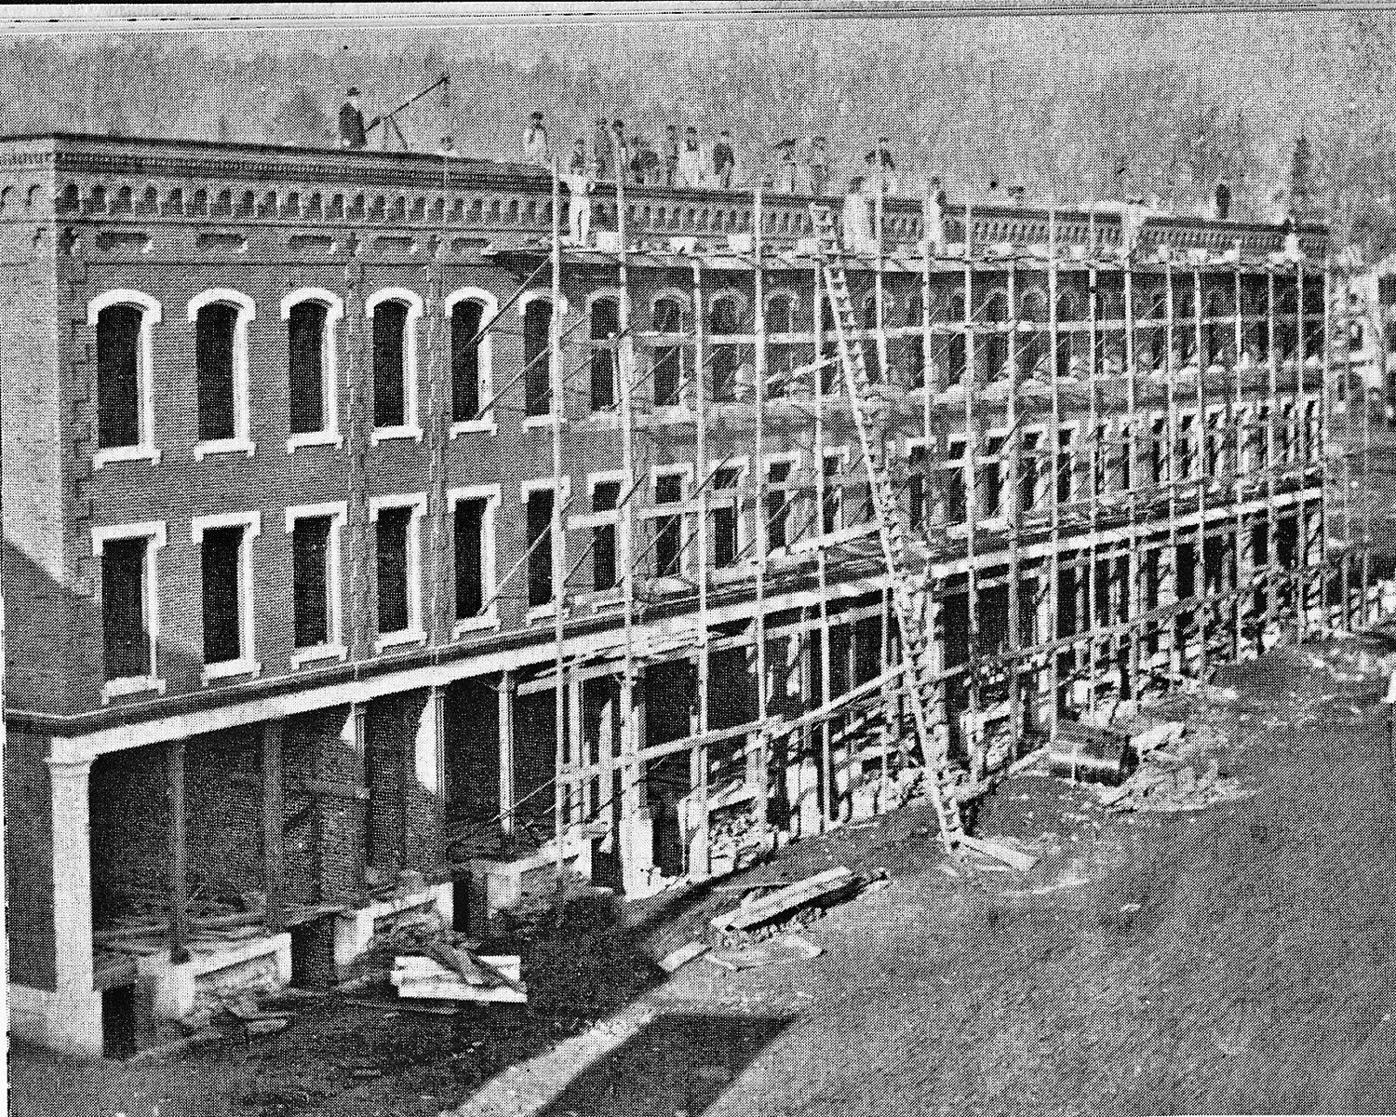 Brattleboro's Defining Decades: 1870 to 1920